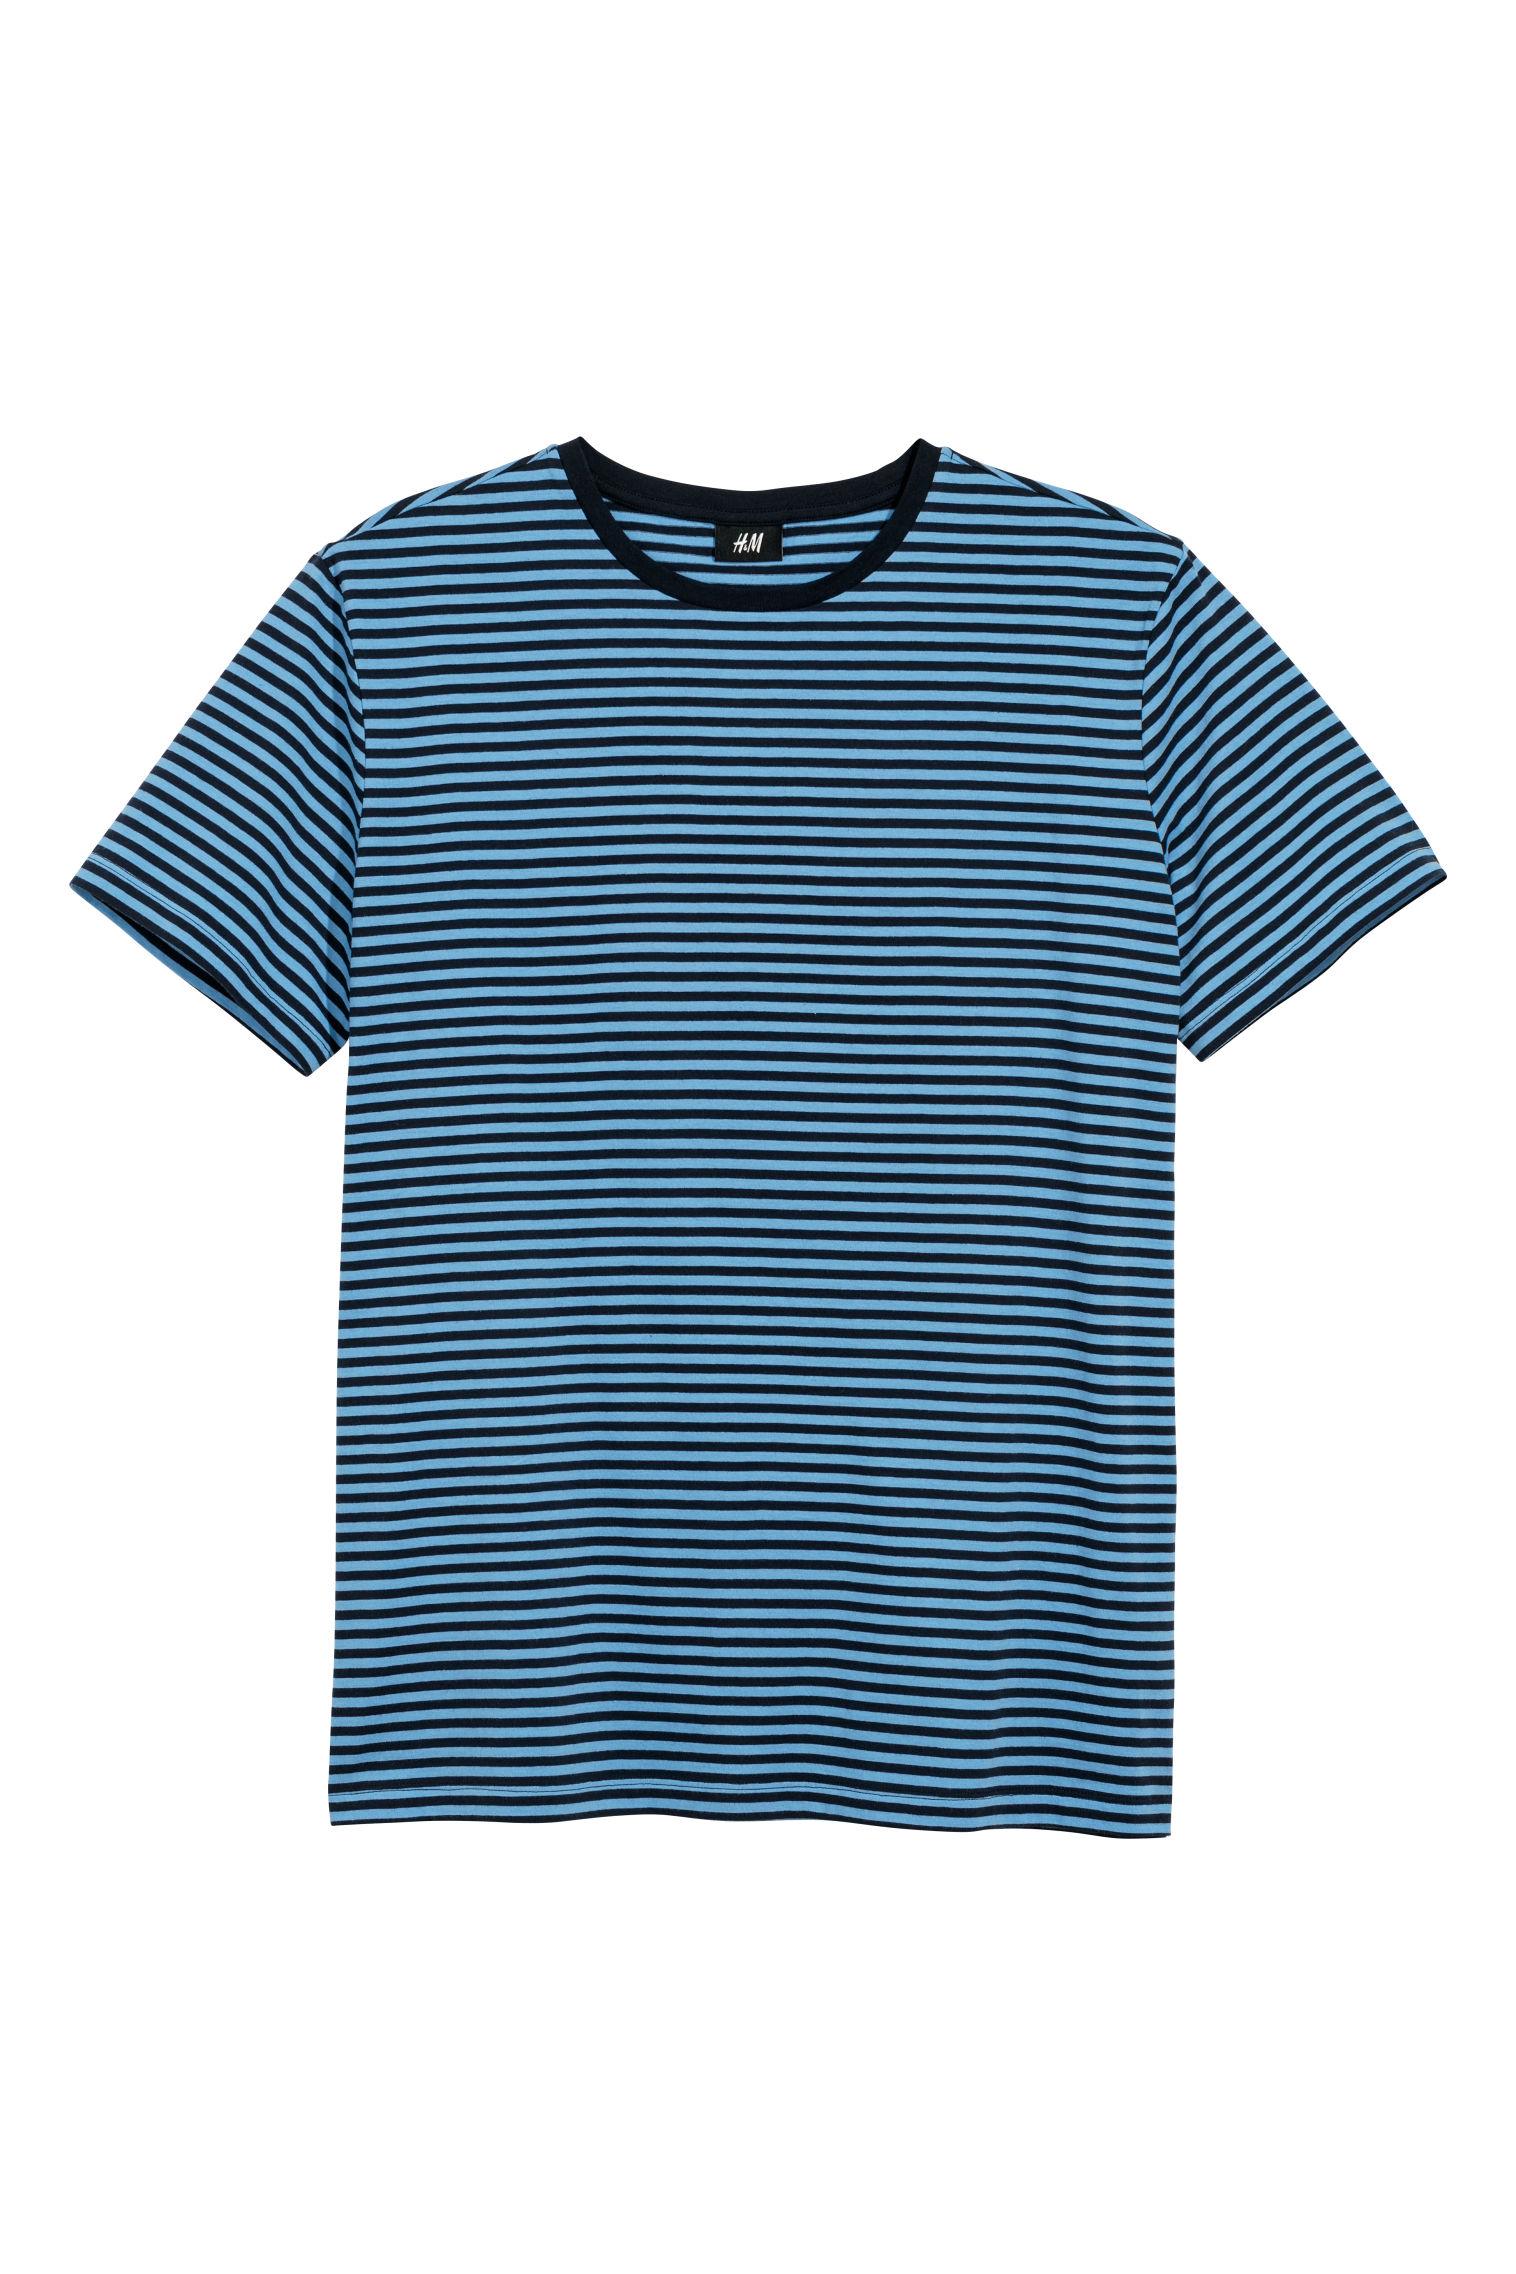 super popular 4c0b8 197e4 Gestreiftes T-Shirt